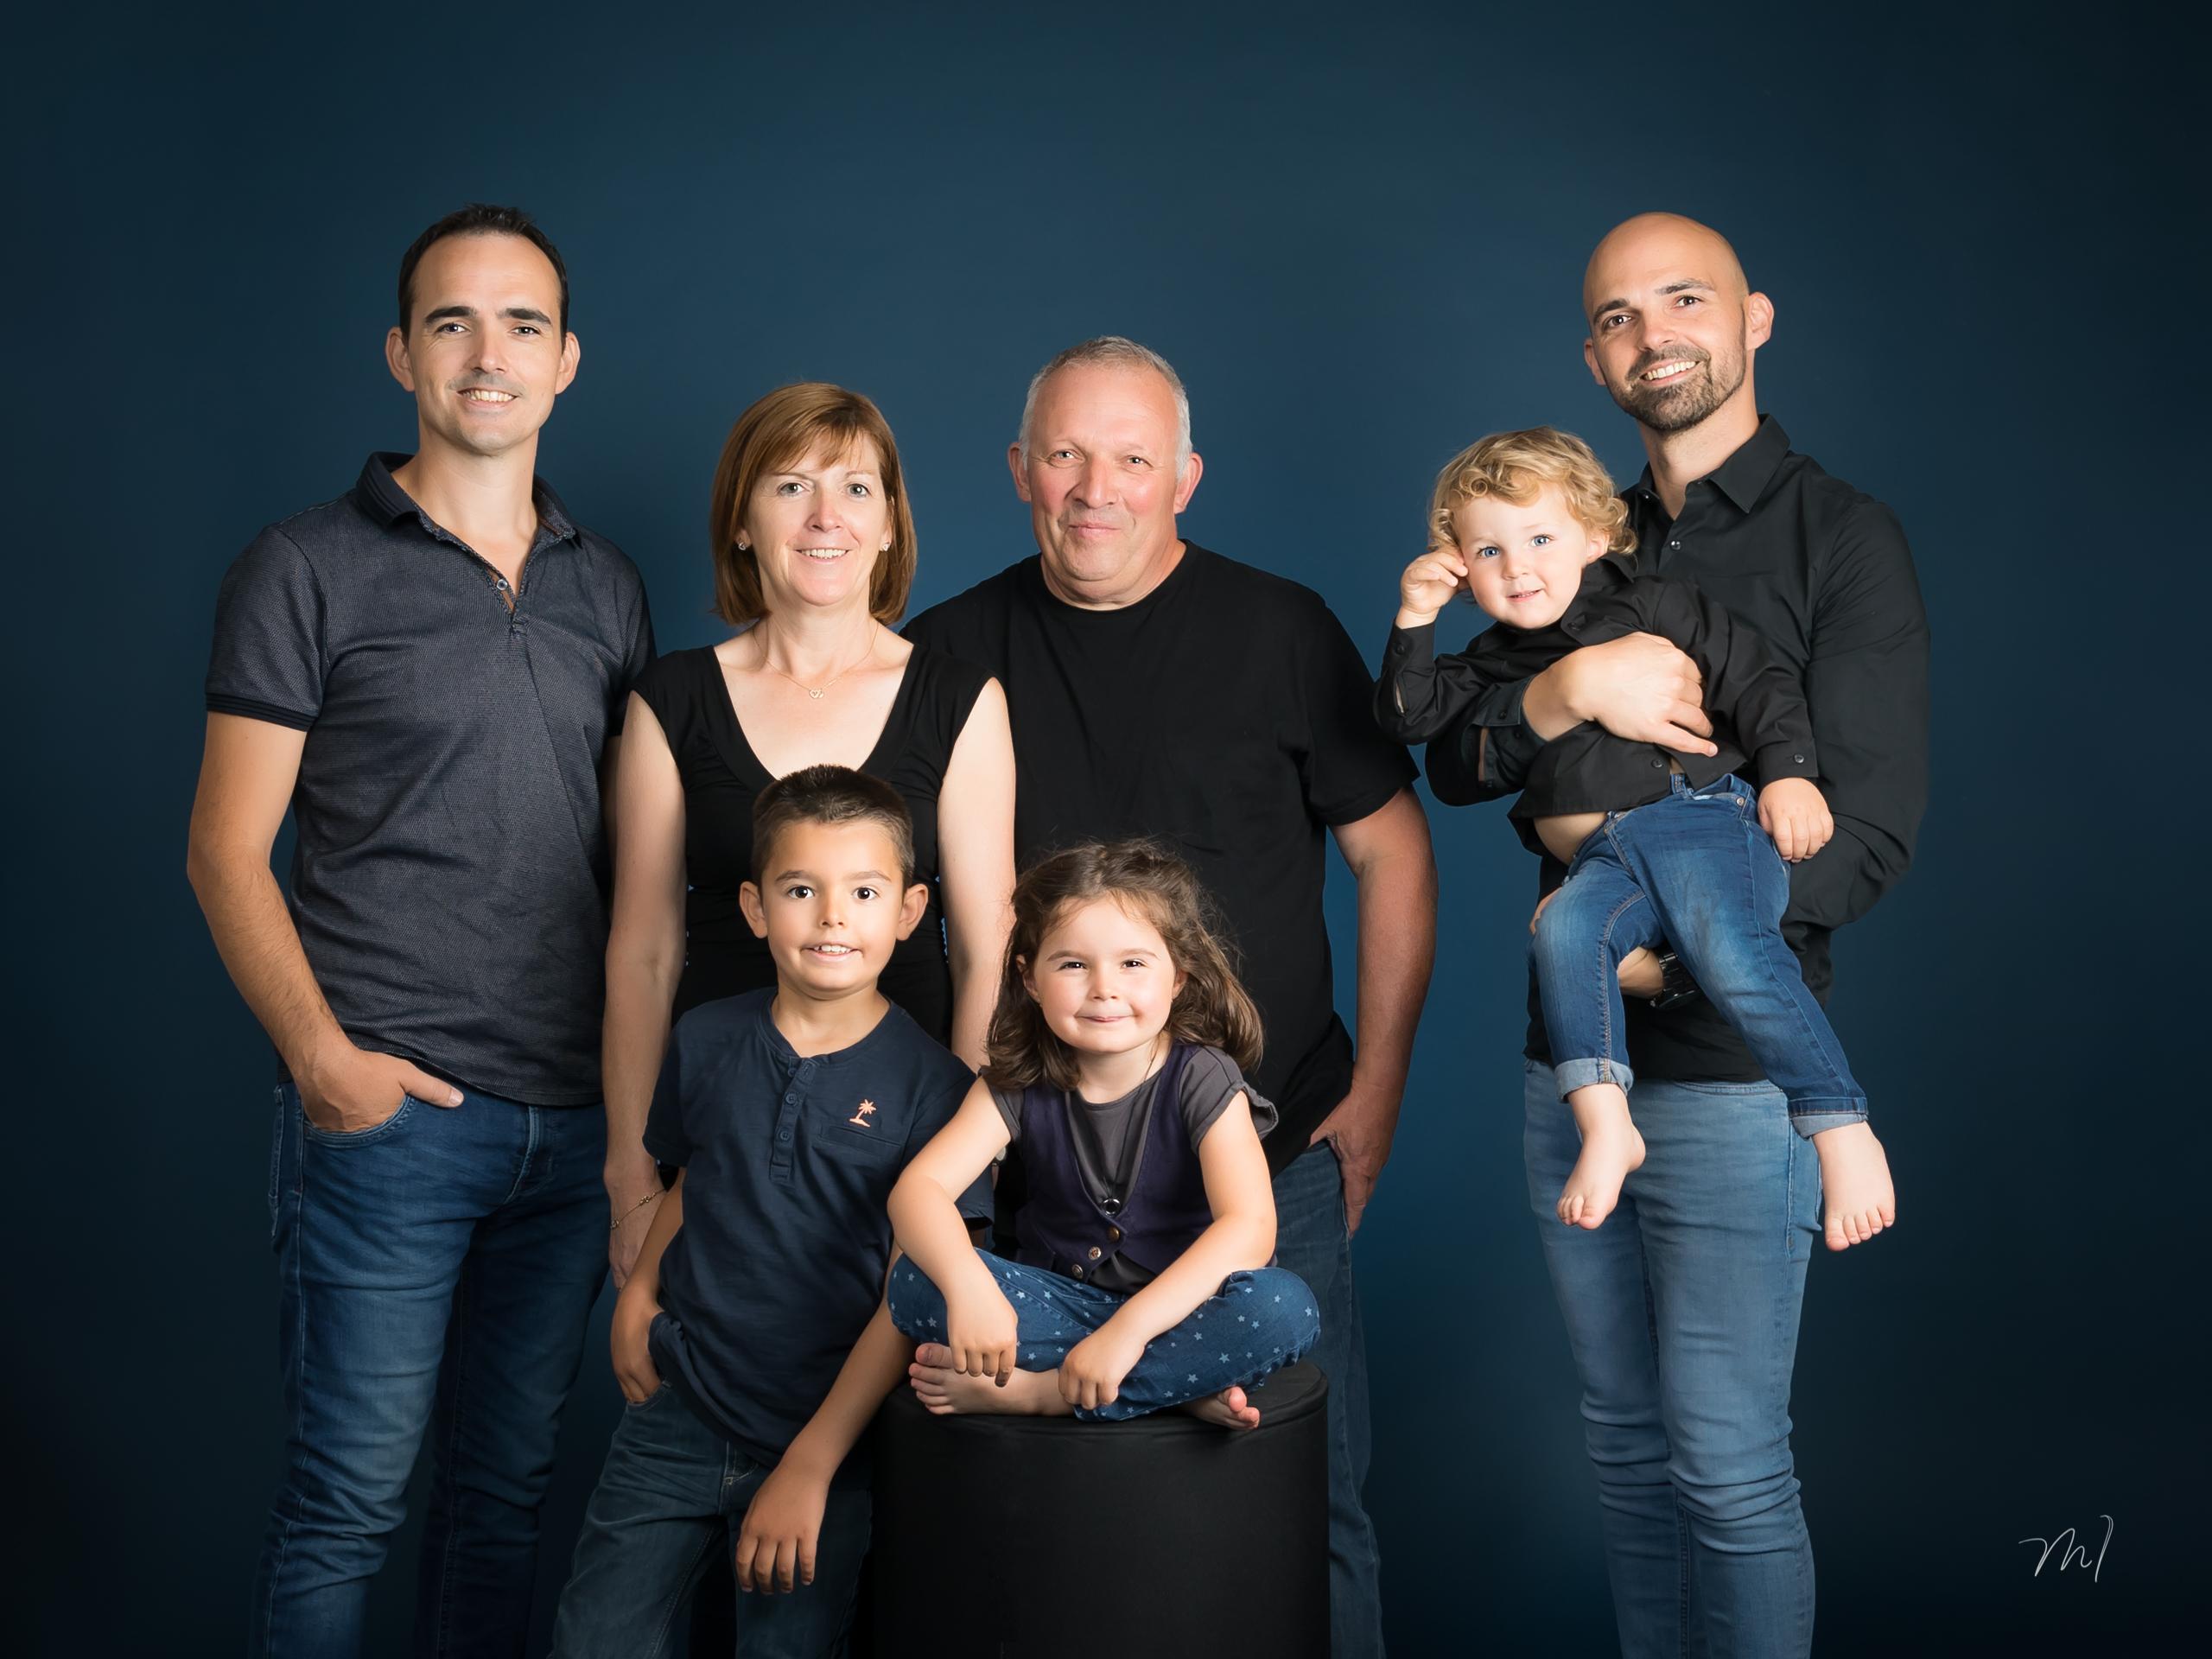 Familles & enfants - Marie Ismalun photographe-16